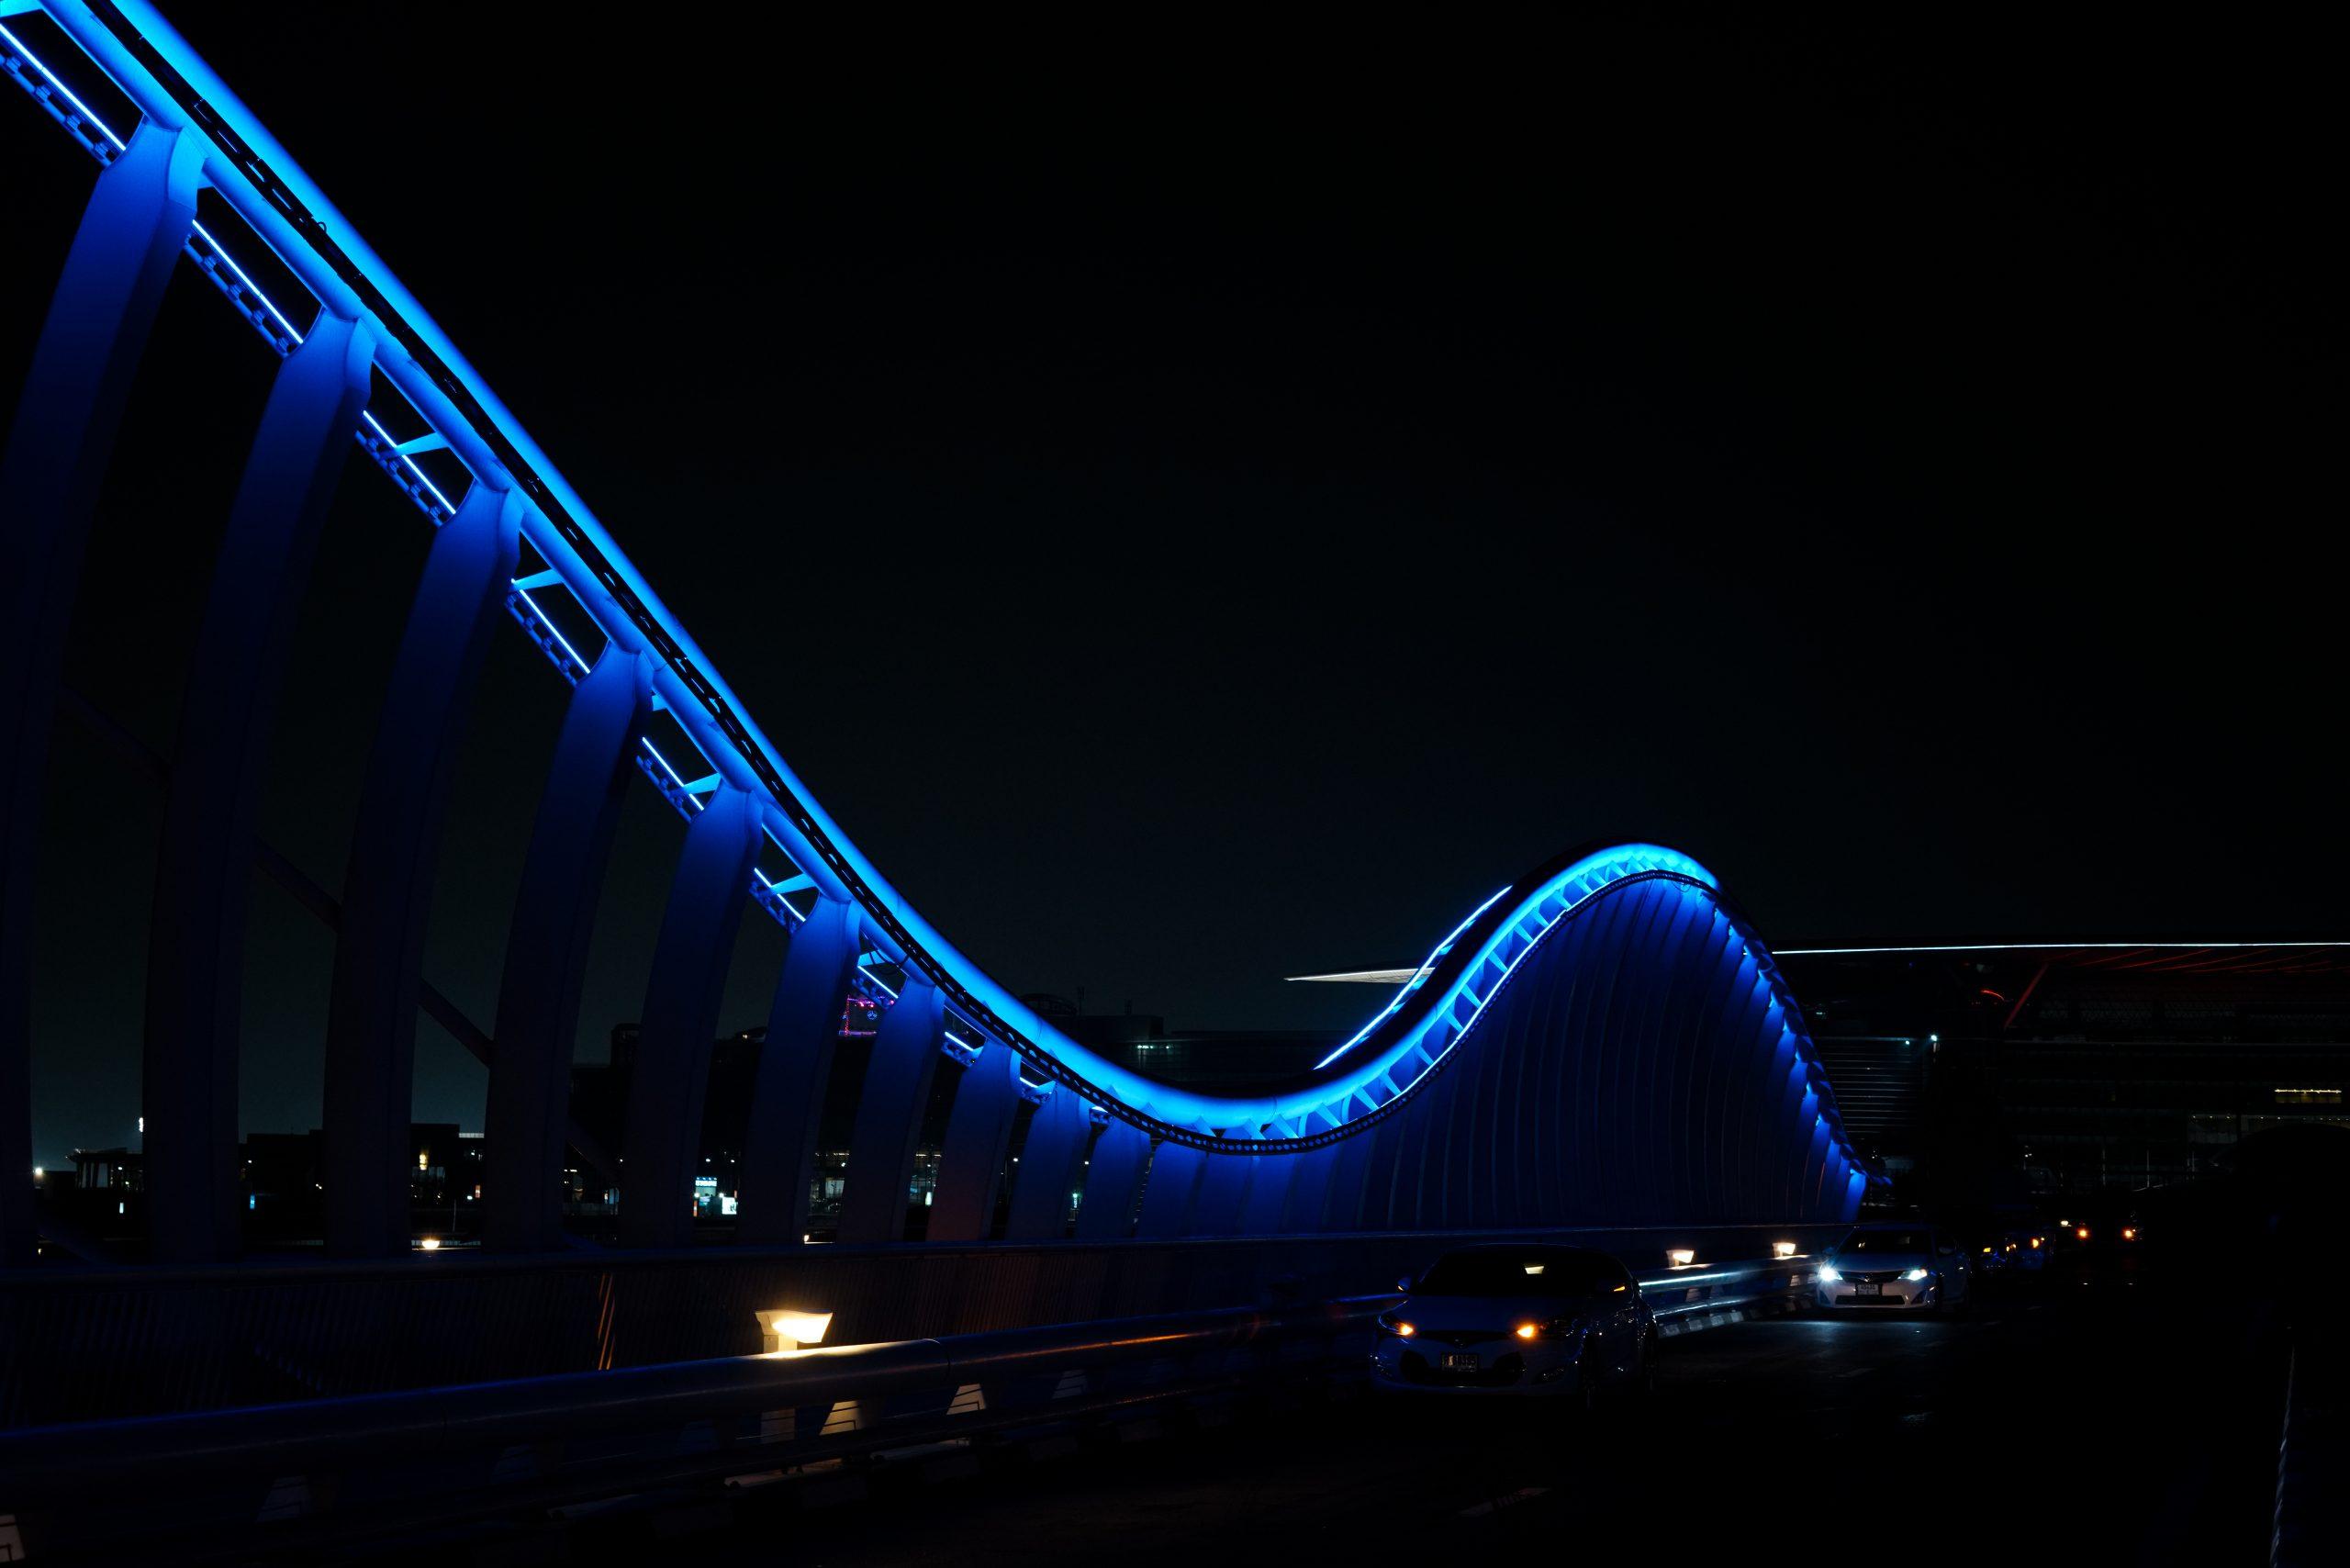 Lighting of a bridge in Dubai